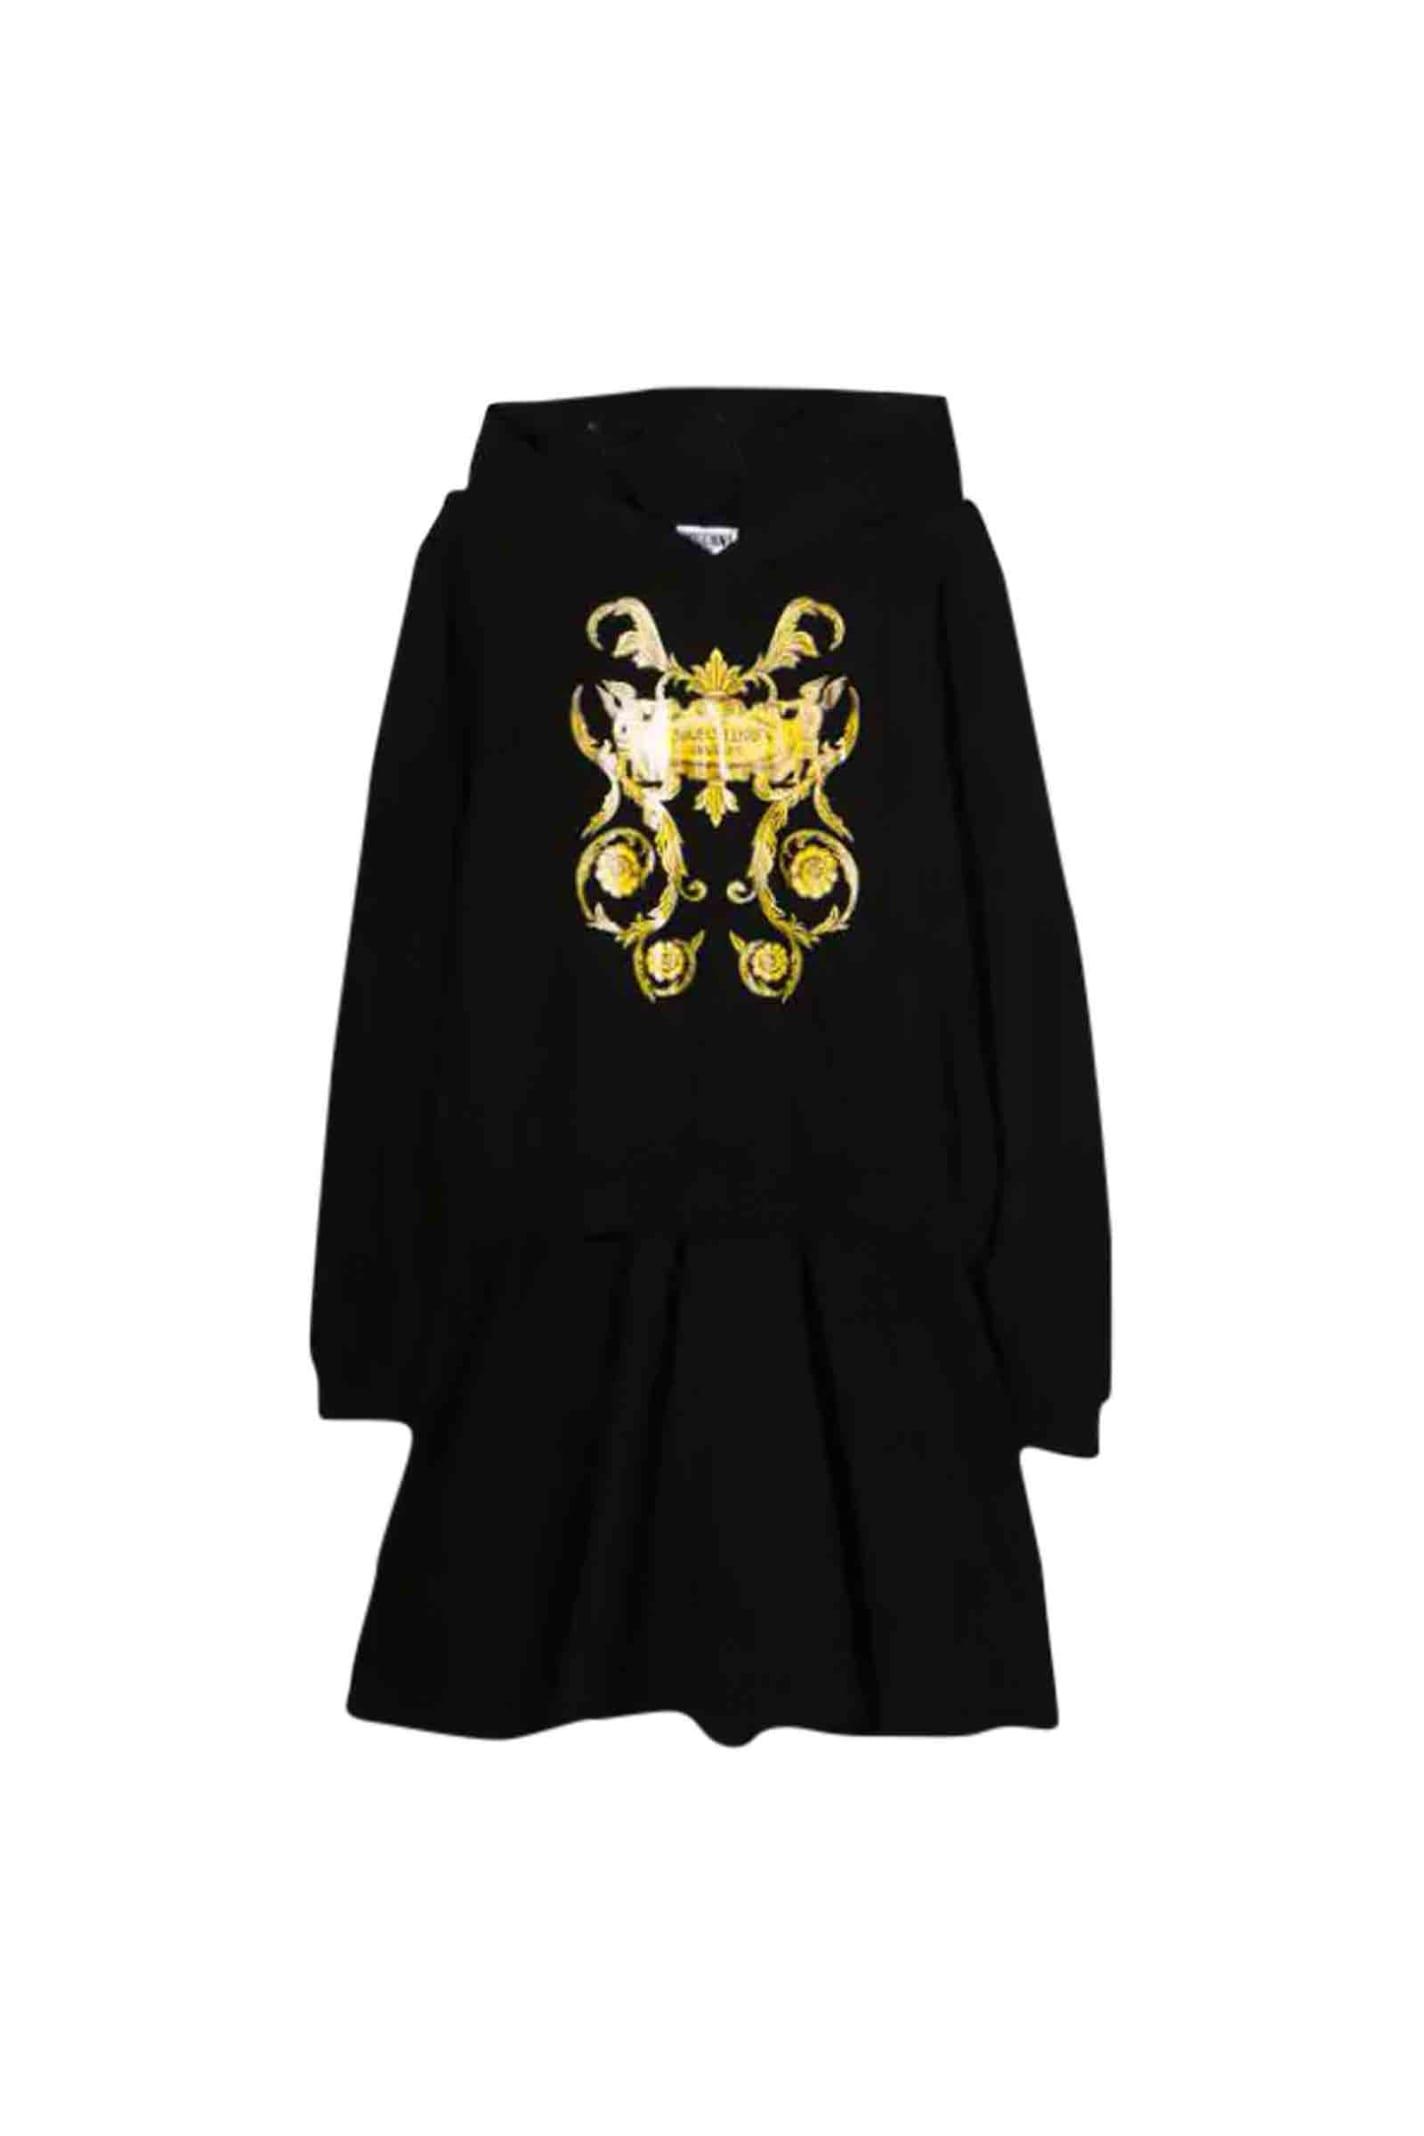 Moschino Dress With Hood